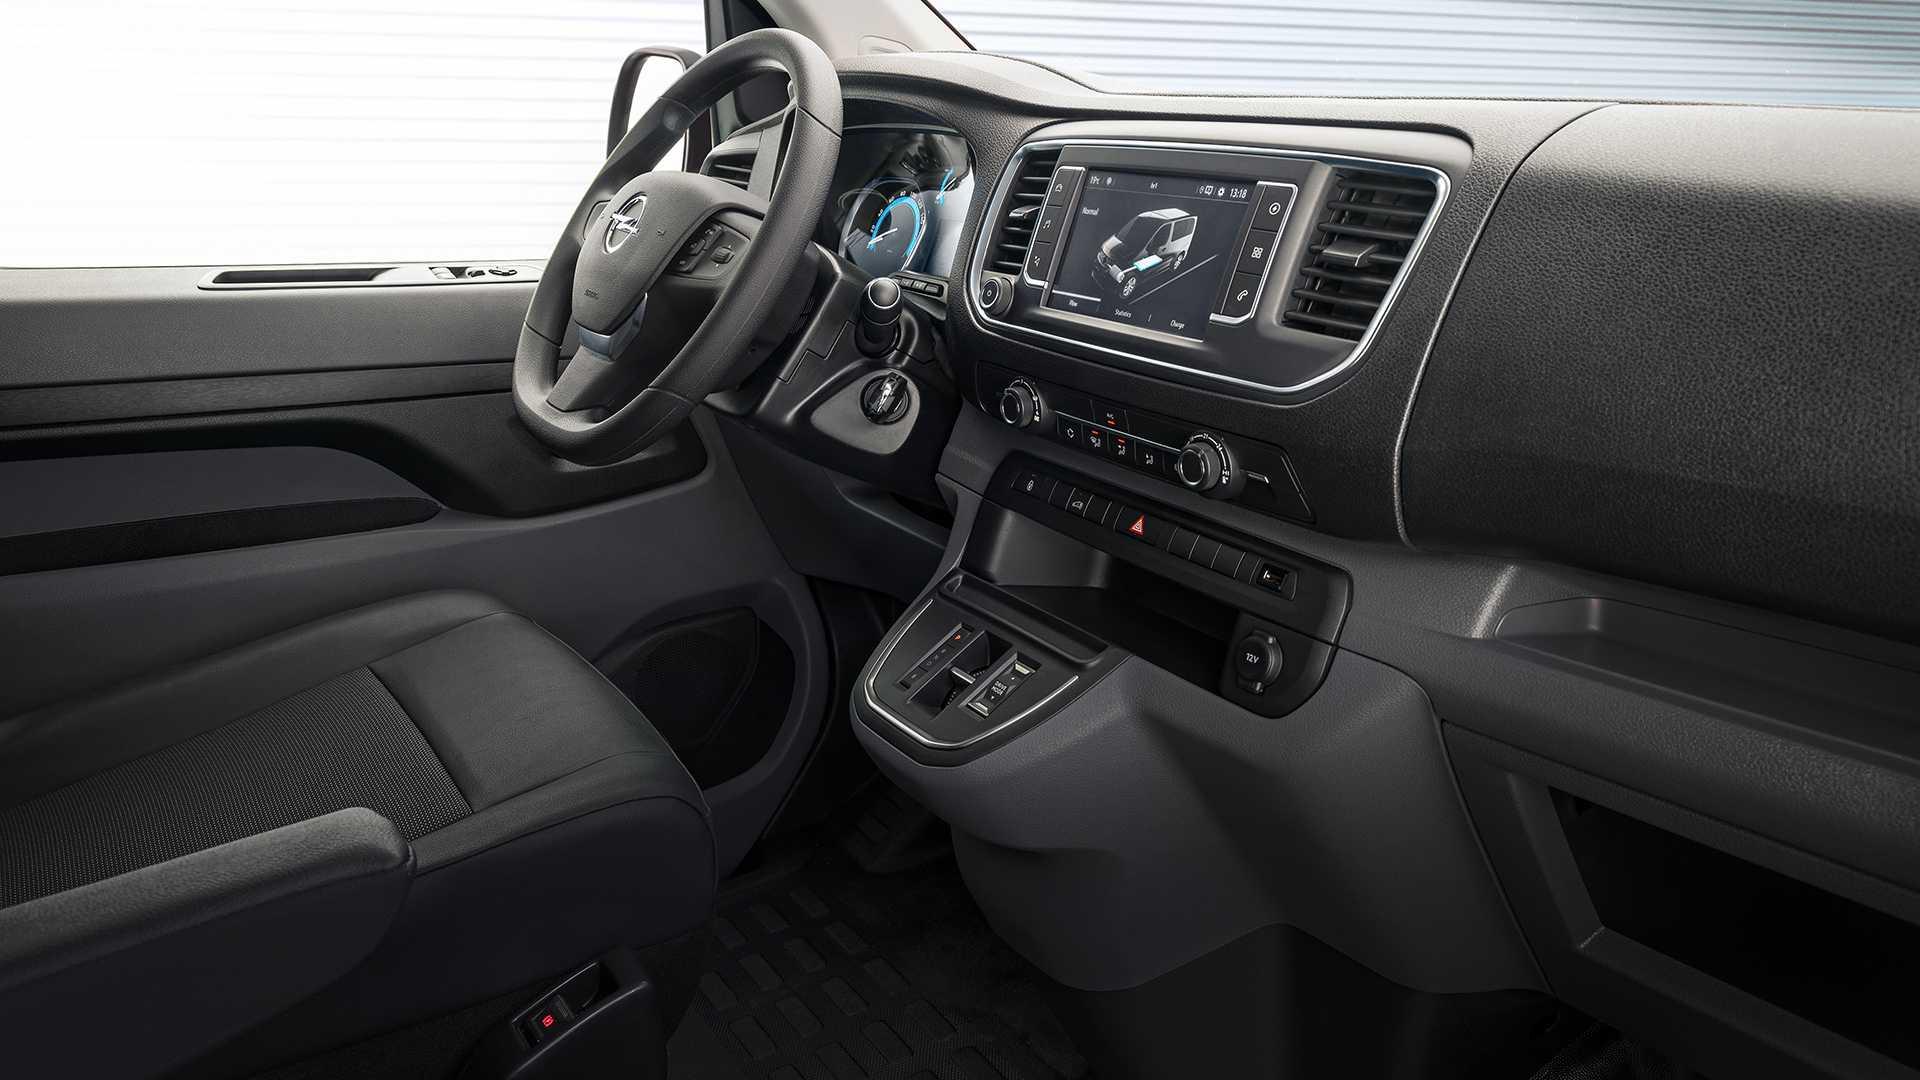 2020 Opel Vivaro New Review